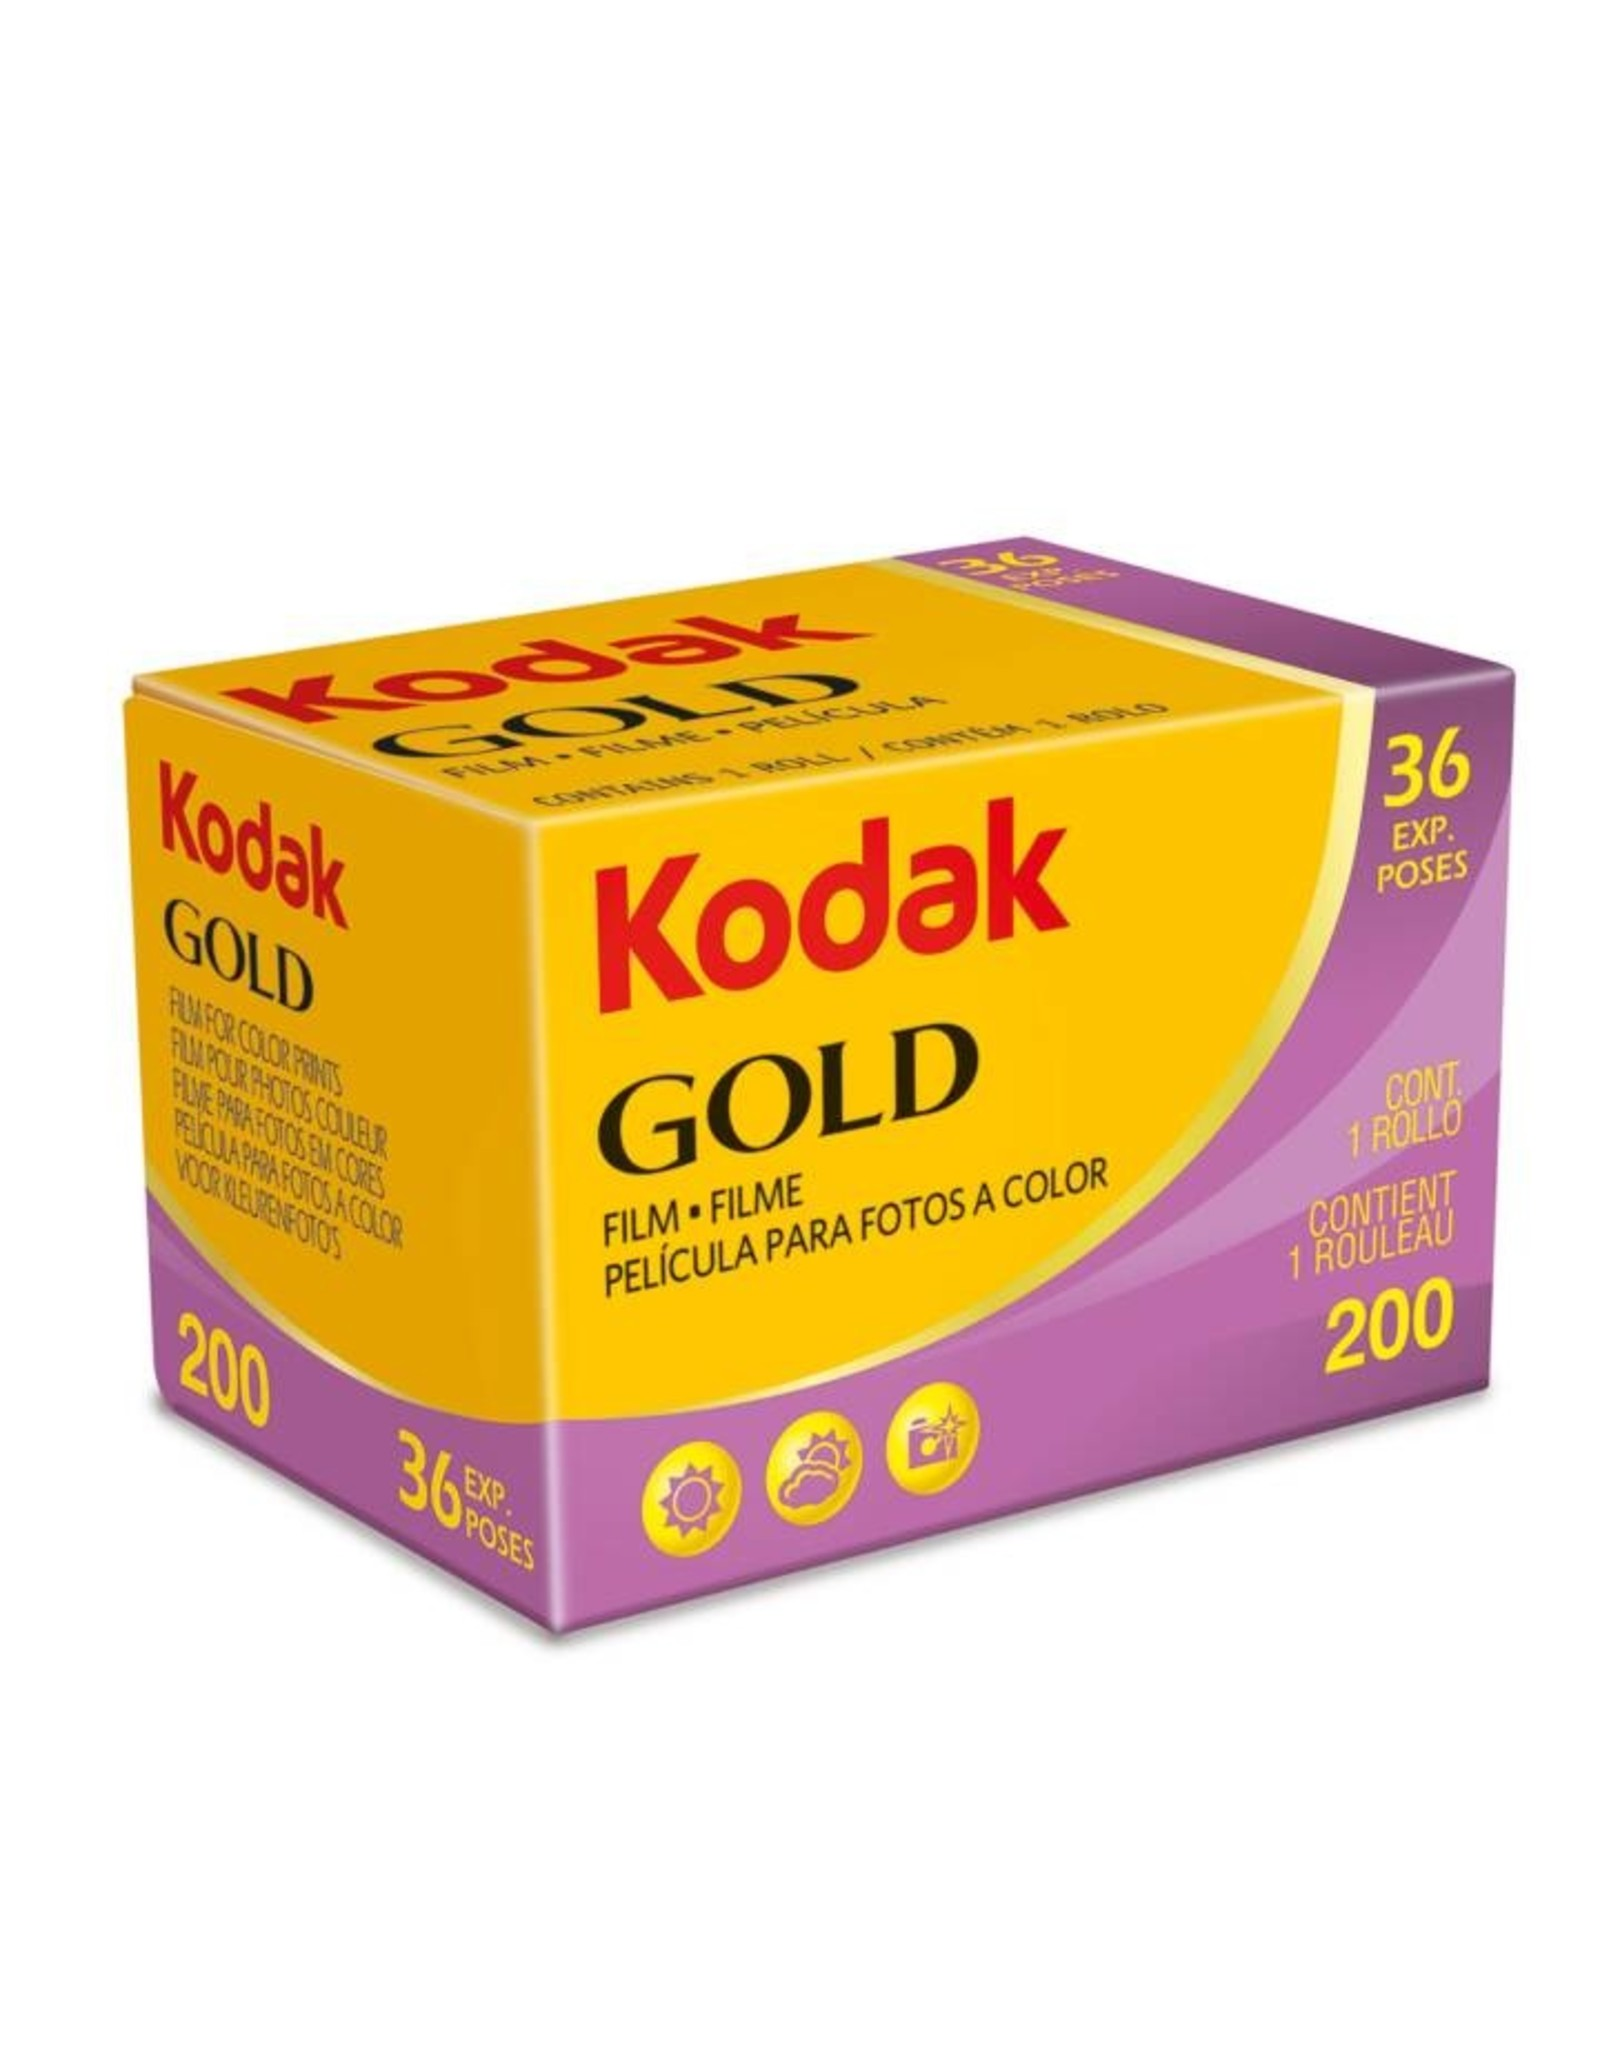 Kodak Kodak GOLD 200  GB 135-36